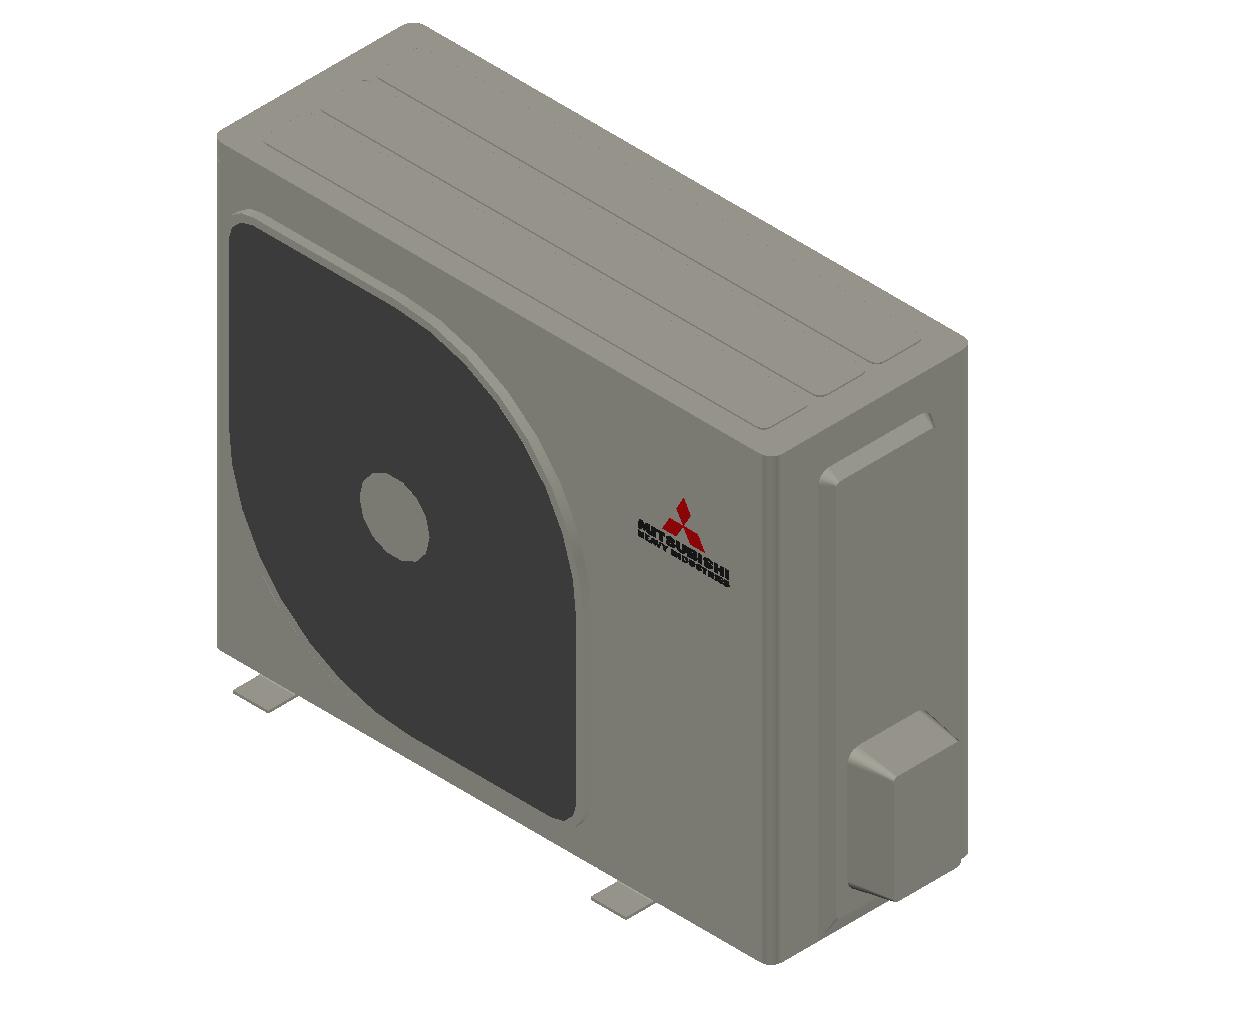 HC_Heat Pump_MEPcontent_Mitsubishi Heavy Industries_PAC-RAC_SRC60ZSX-W1_INT-EN.dwg